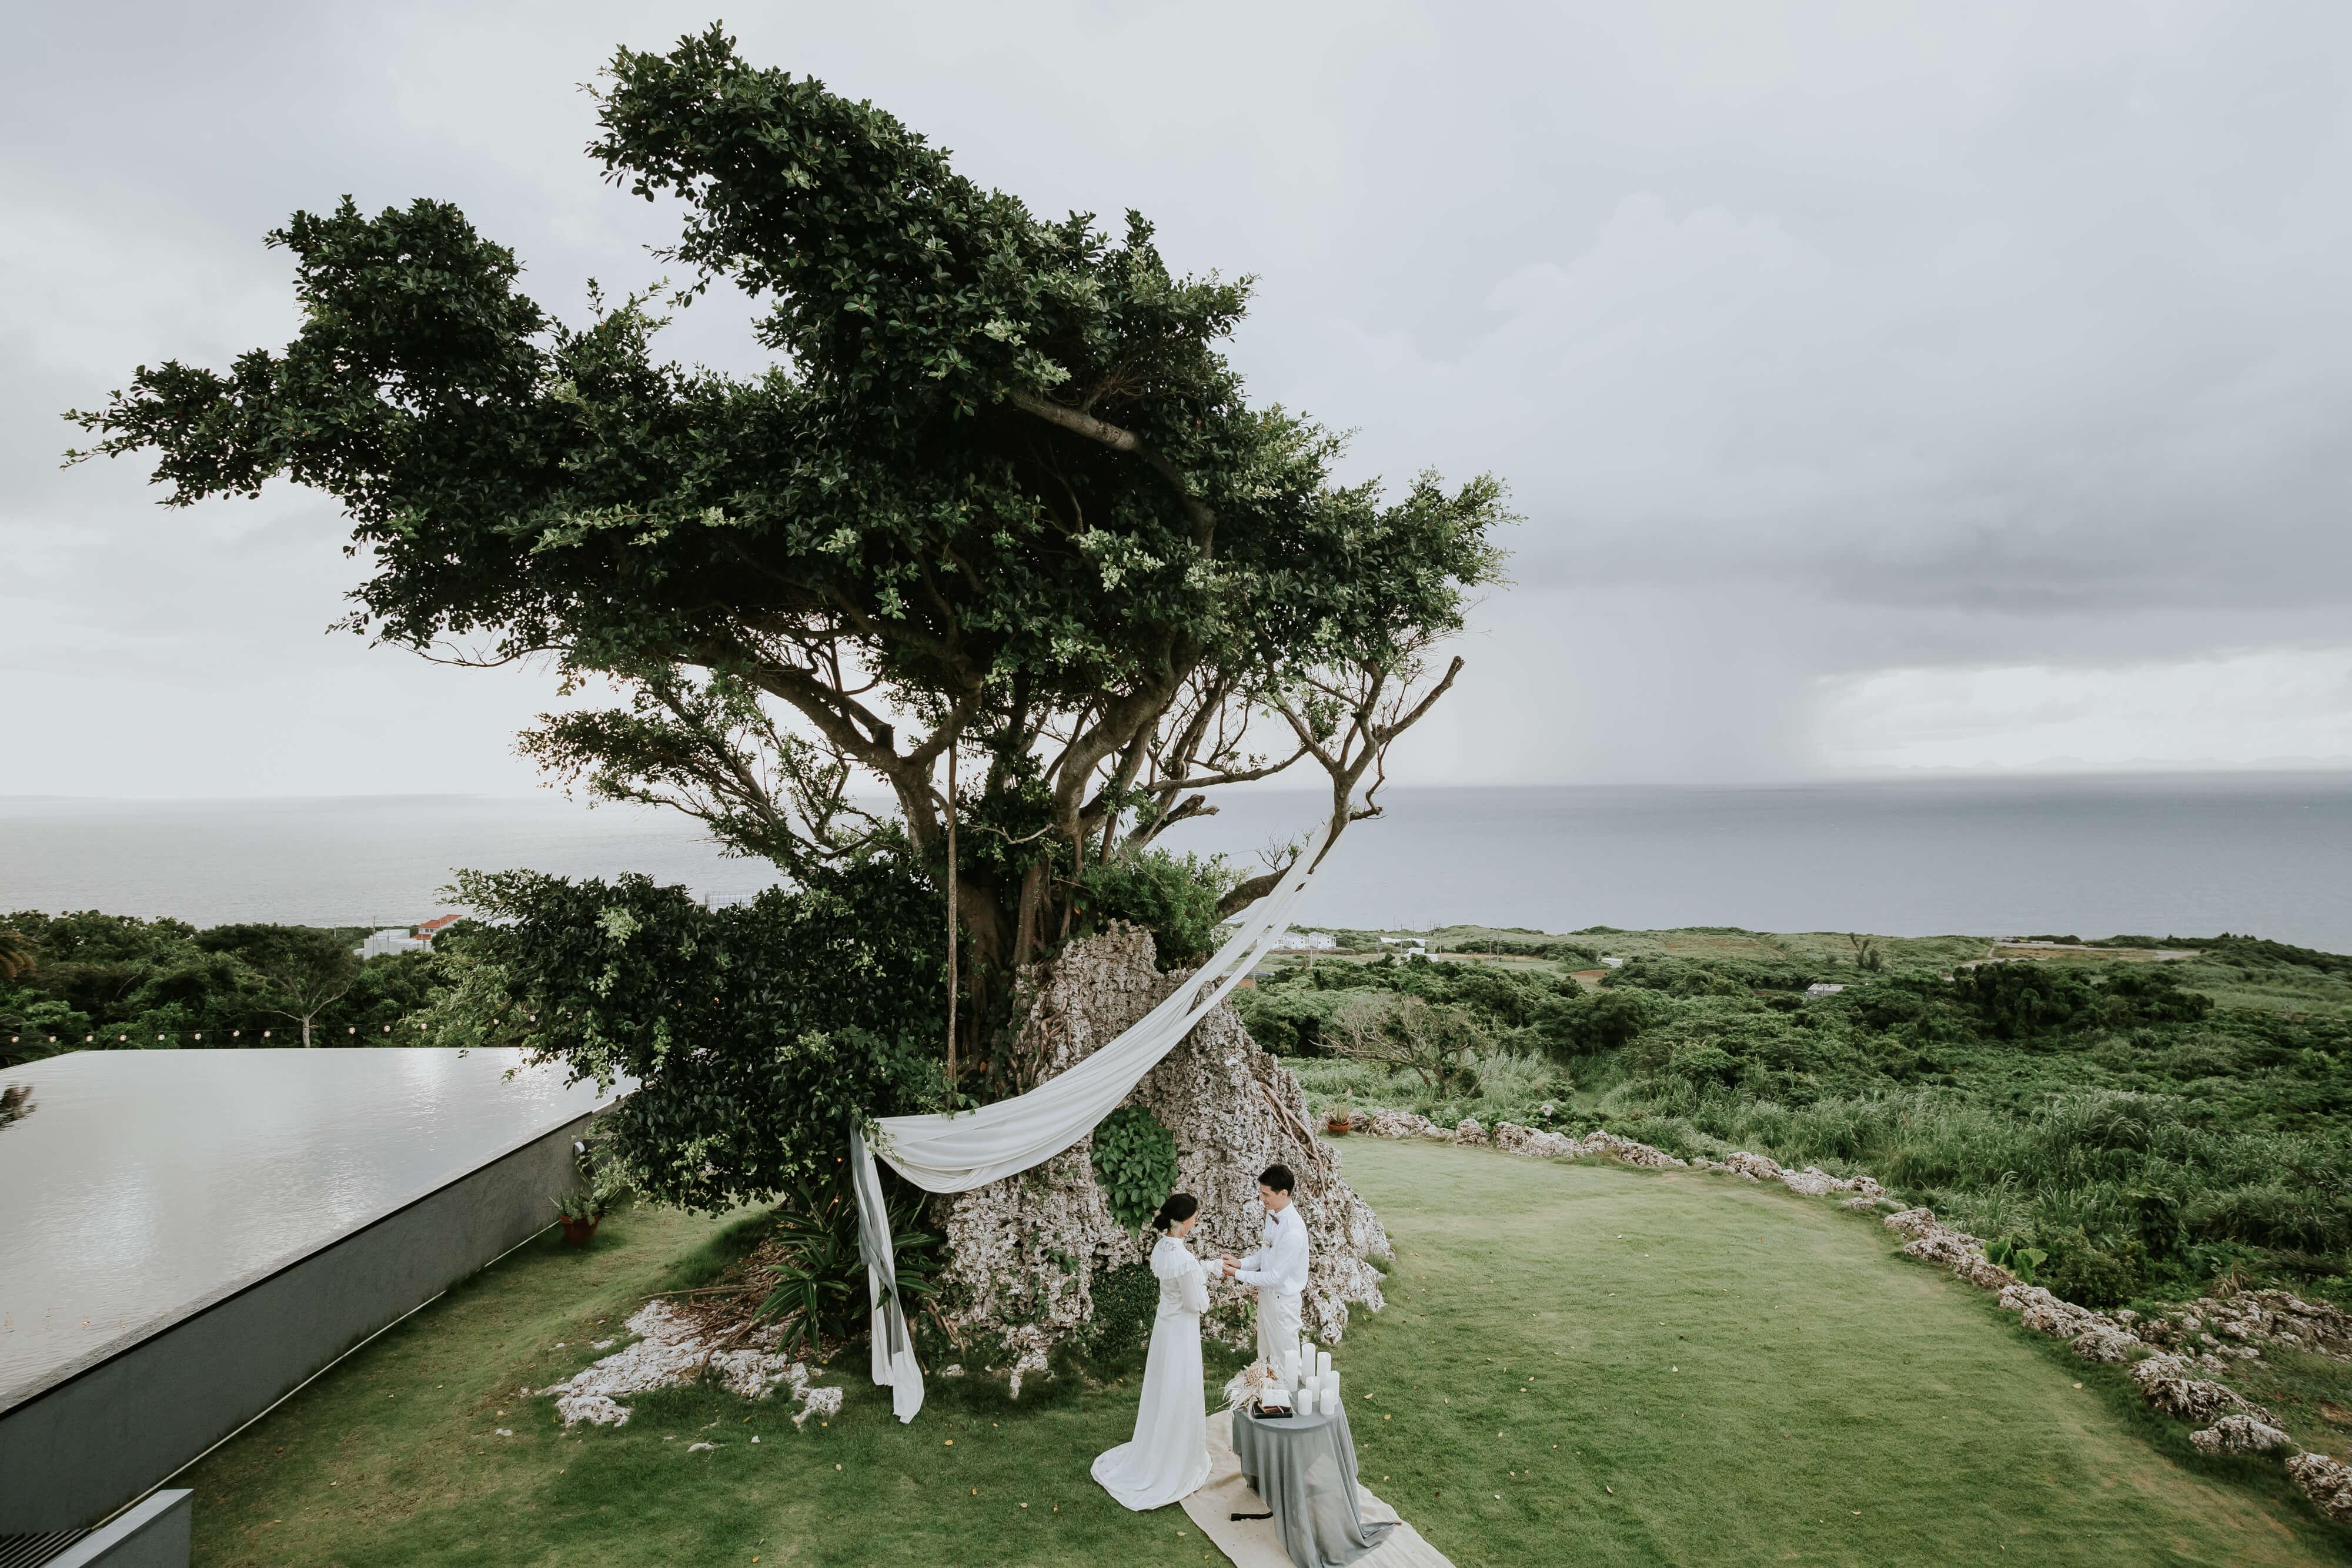 BRAPLA 吉田 美江 by P-style weddingの画像2